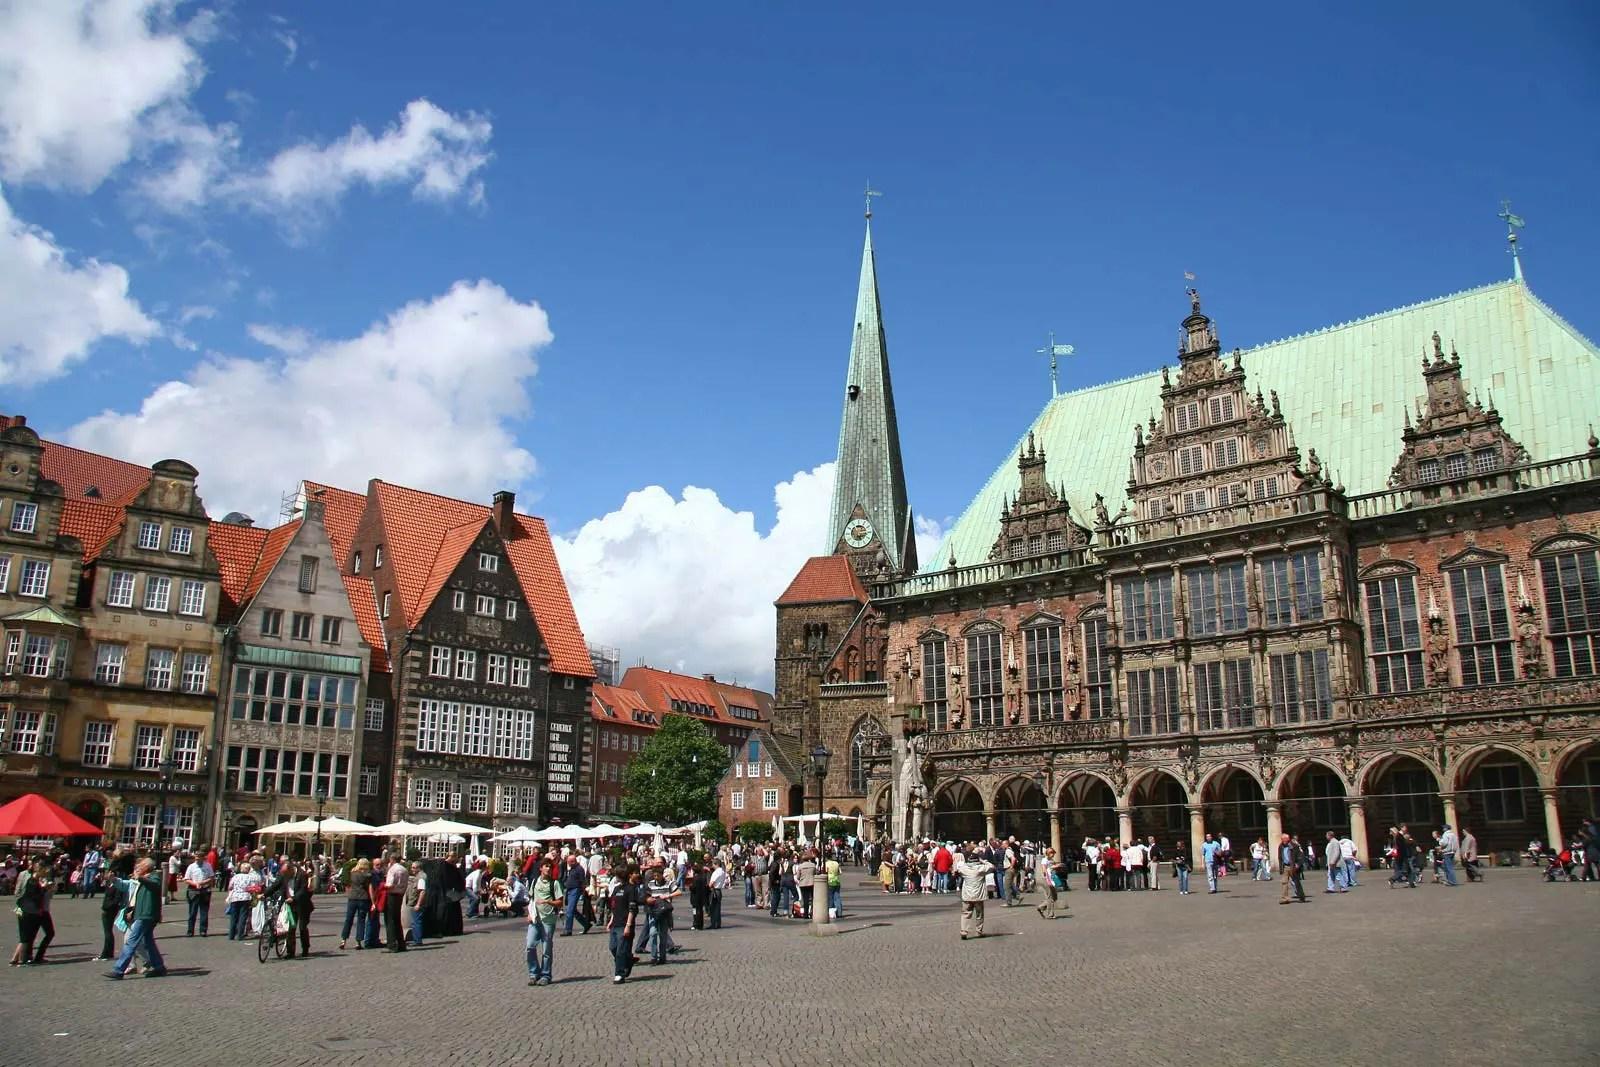 Market Square in Bremen